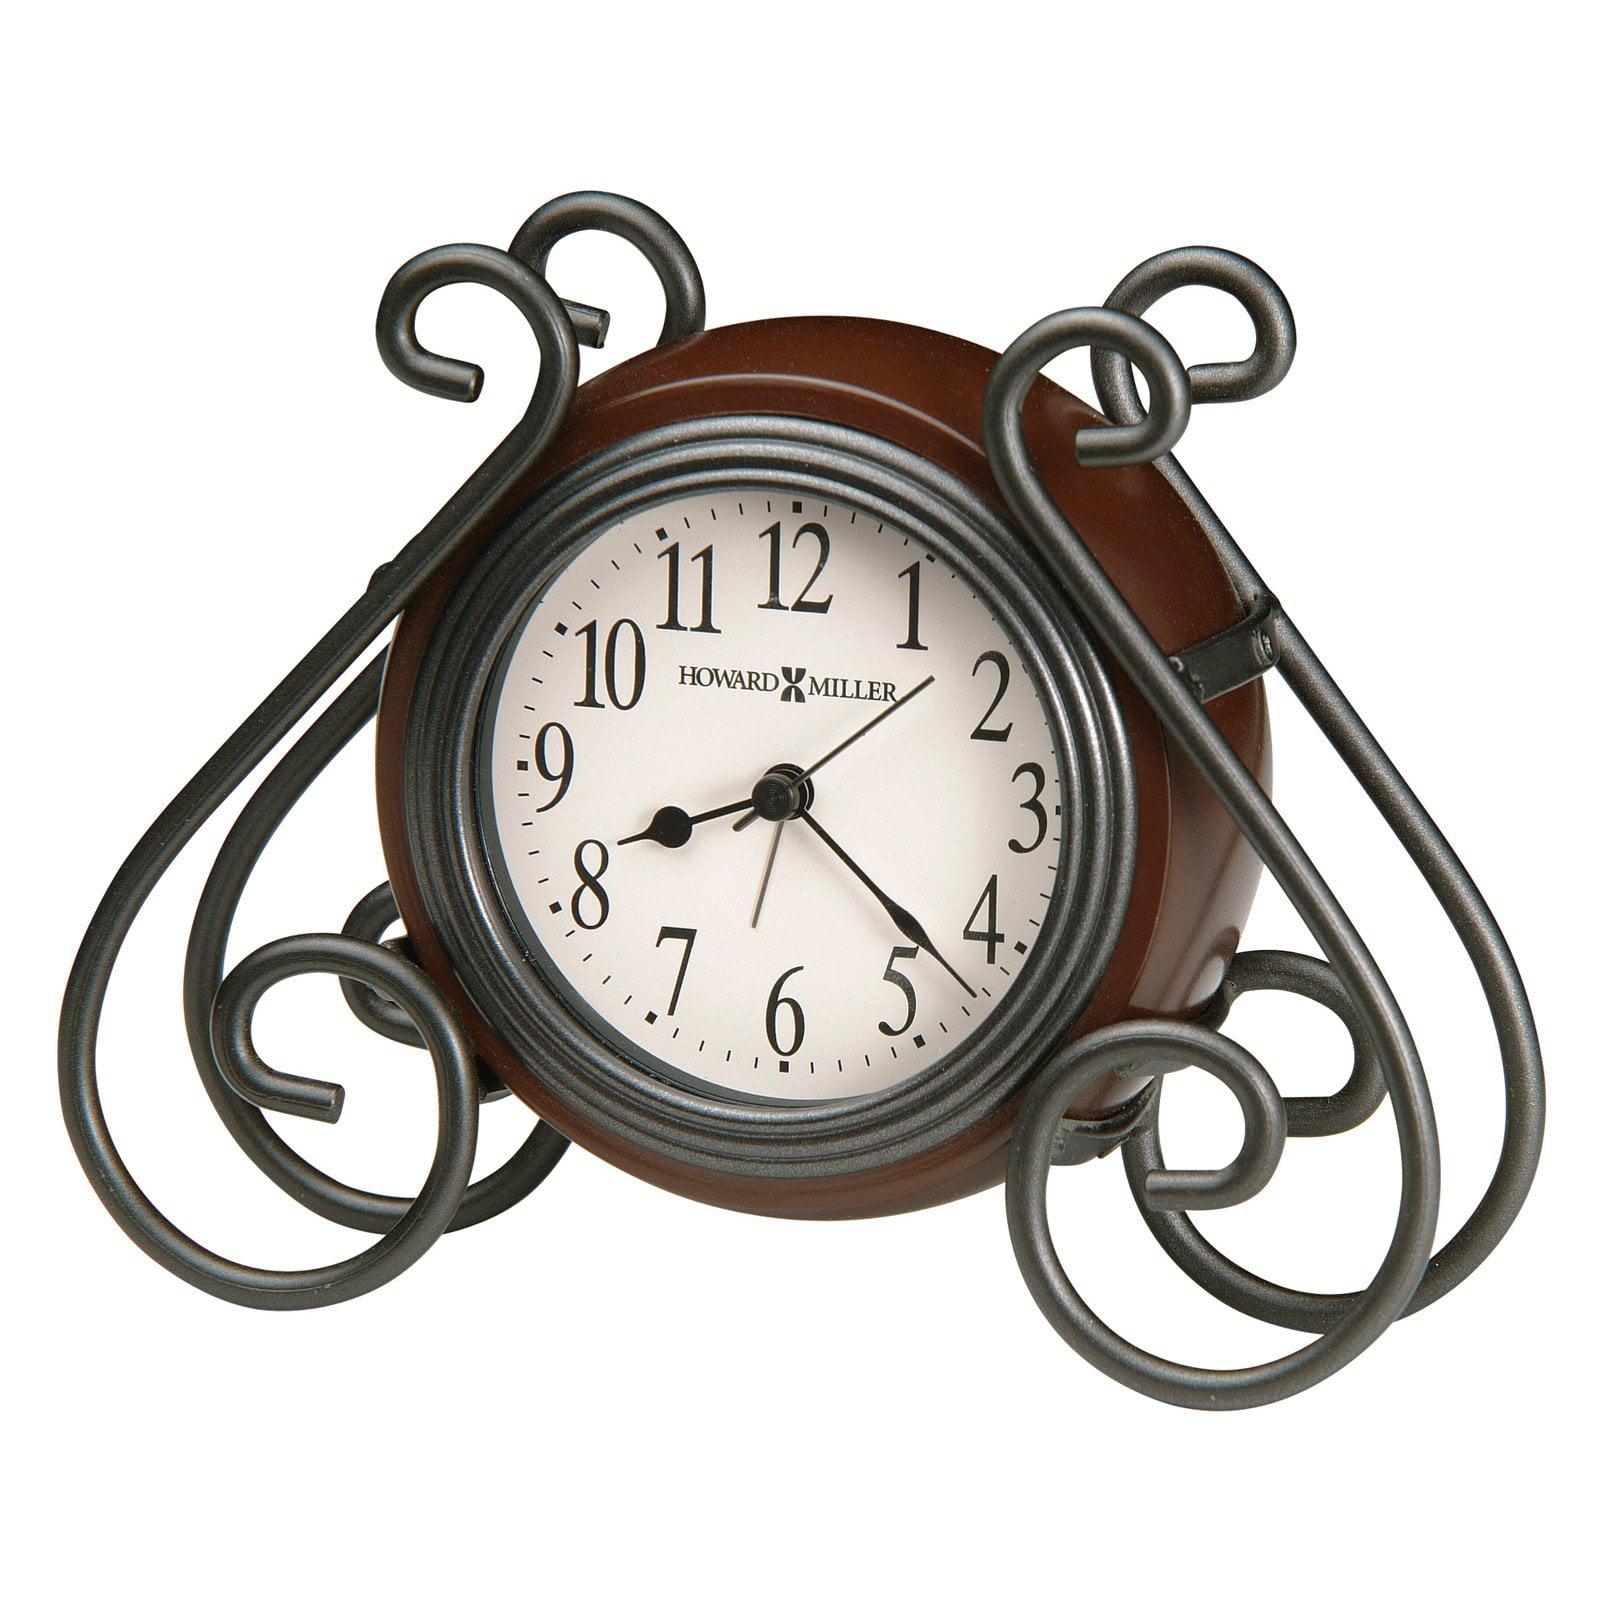 Howard Miller 645-636 Diane Mantel Clock by Howard Miller